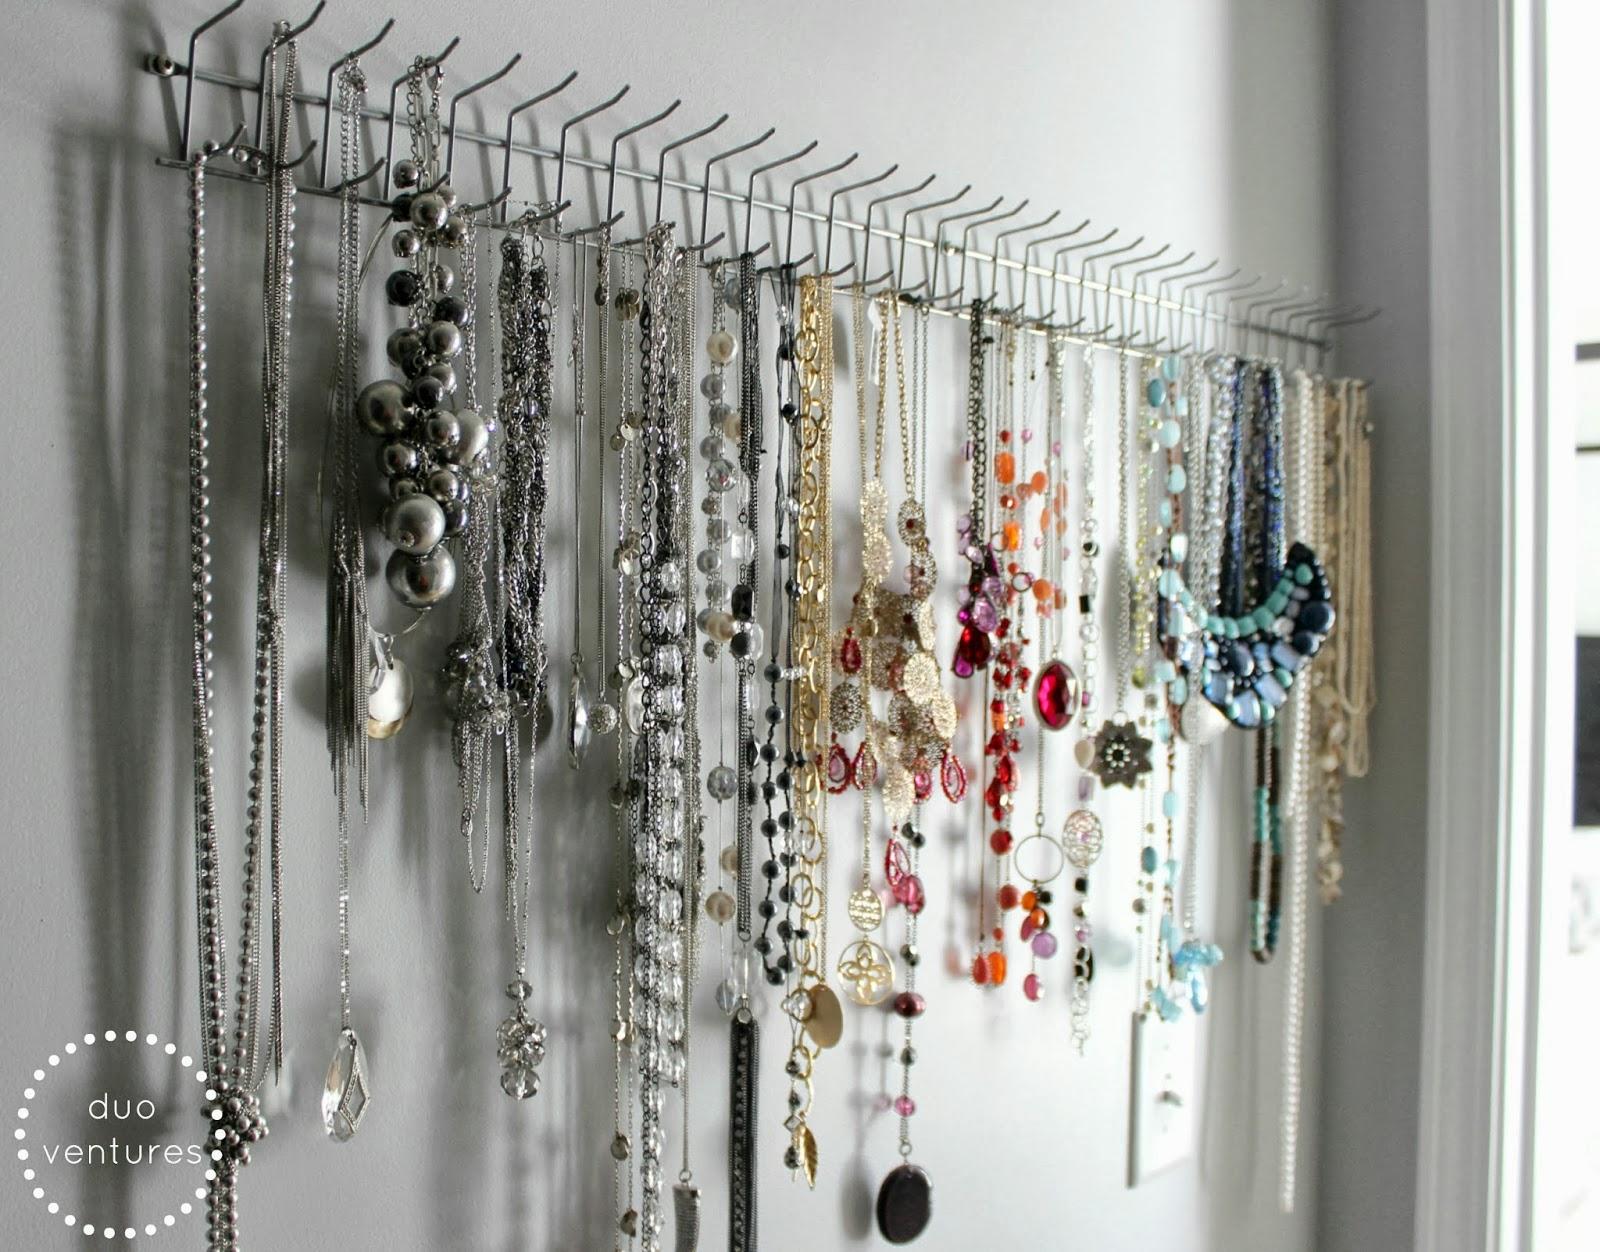 Duo Ventures Organizing Jewelry